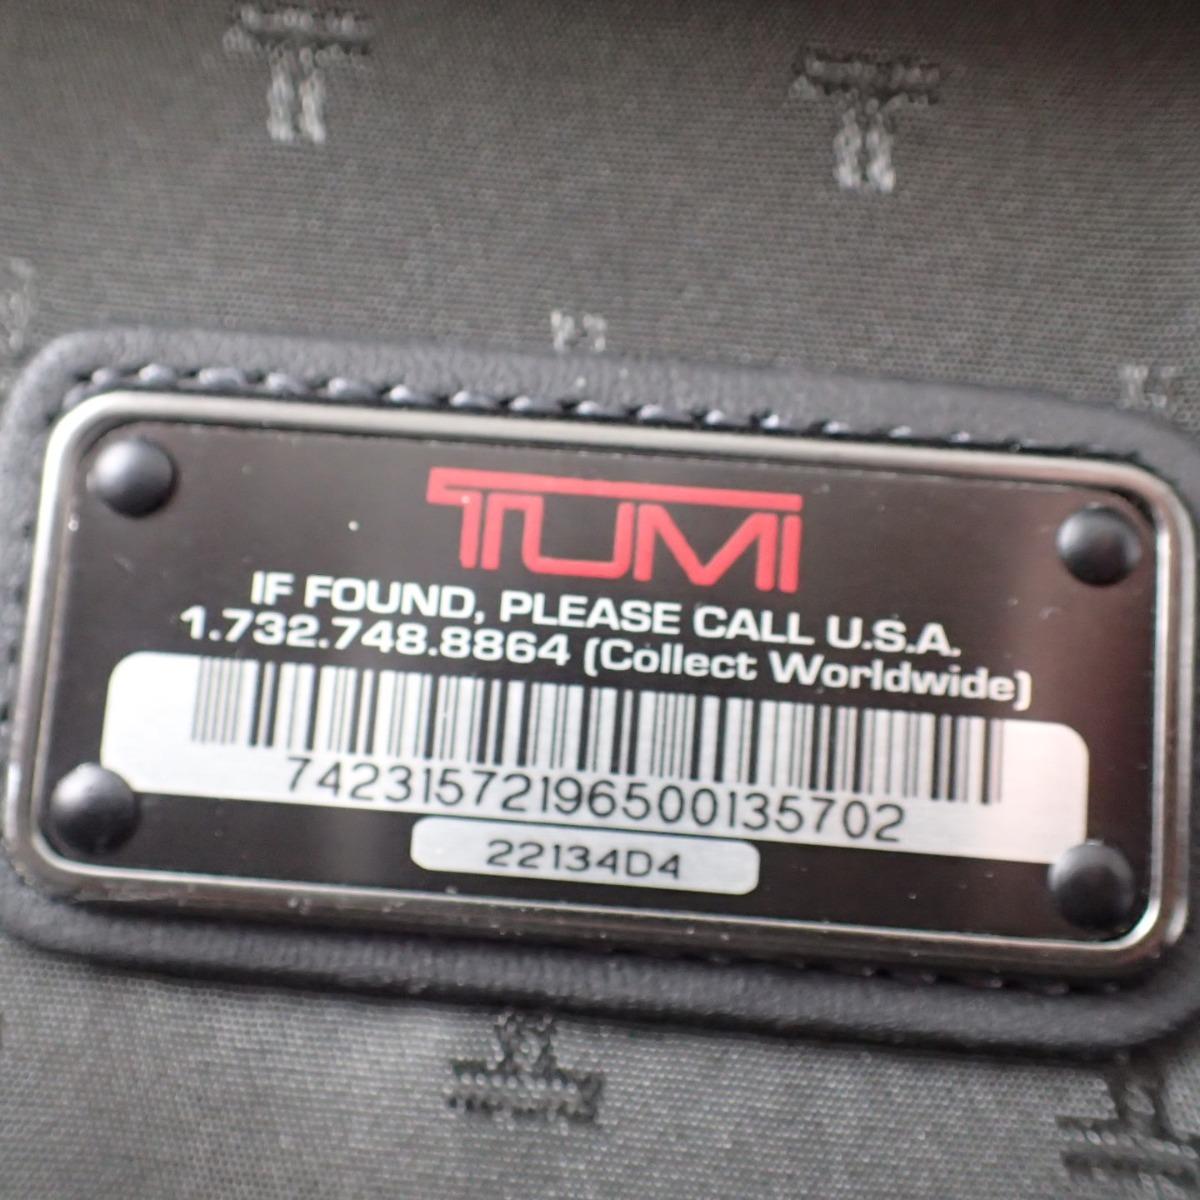 TUMI トゥミ 22134D4 ALPHAアルファ 2WAYショルダー ガーメントケースビジネスバッグ ブラック メンズeIWEH2YbD9